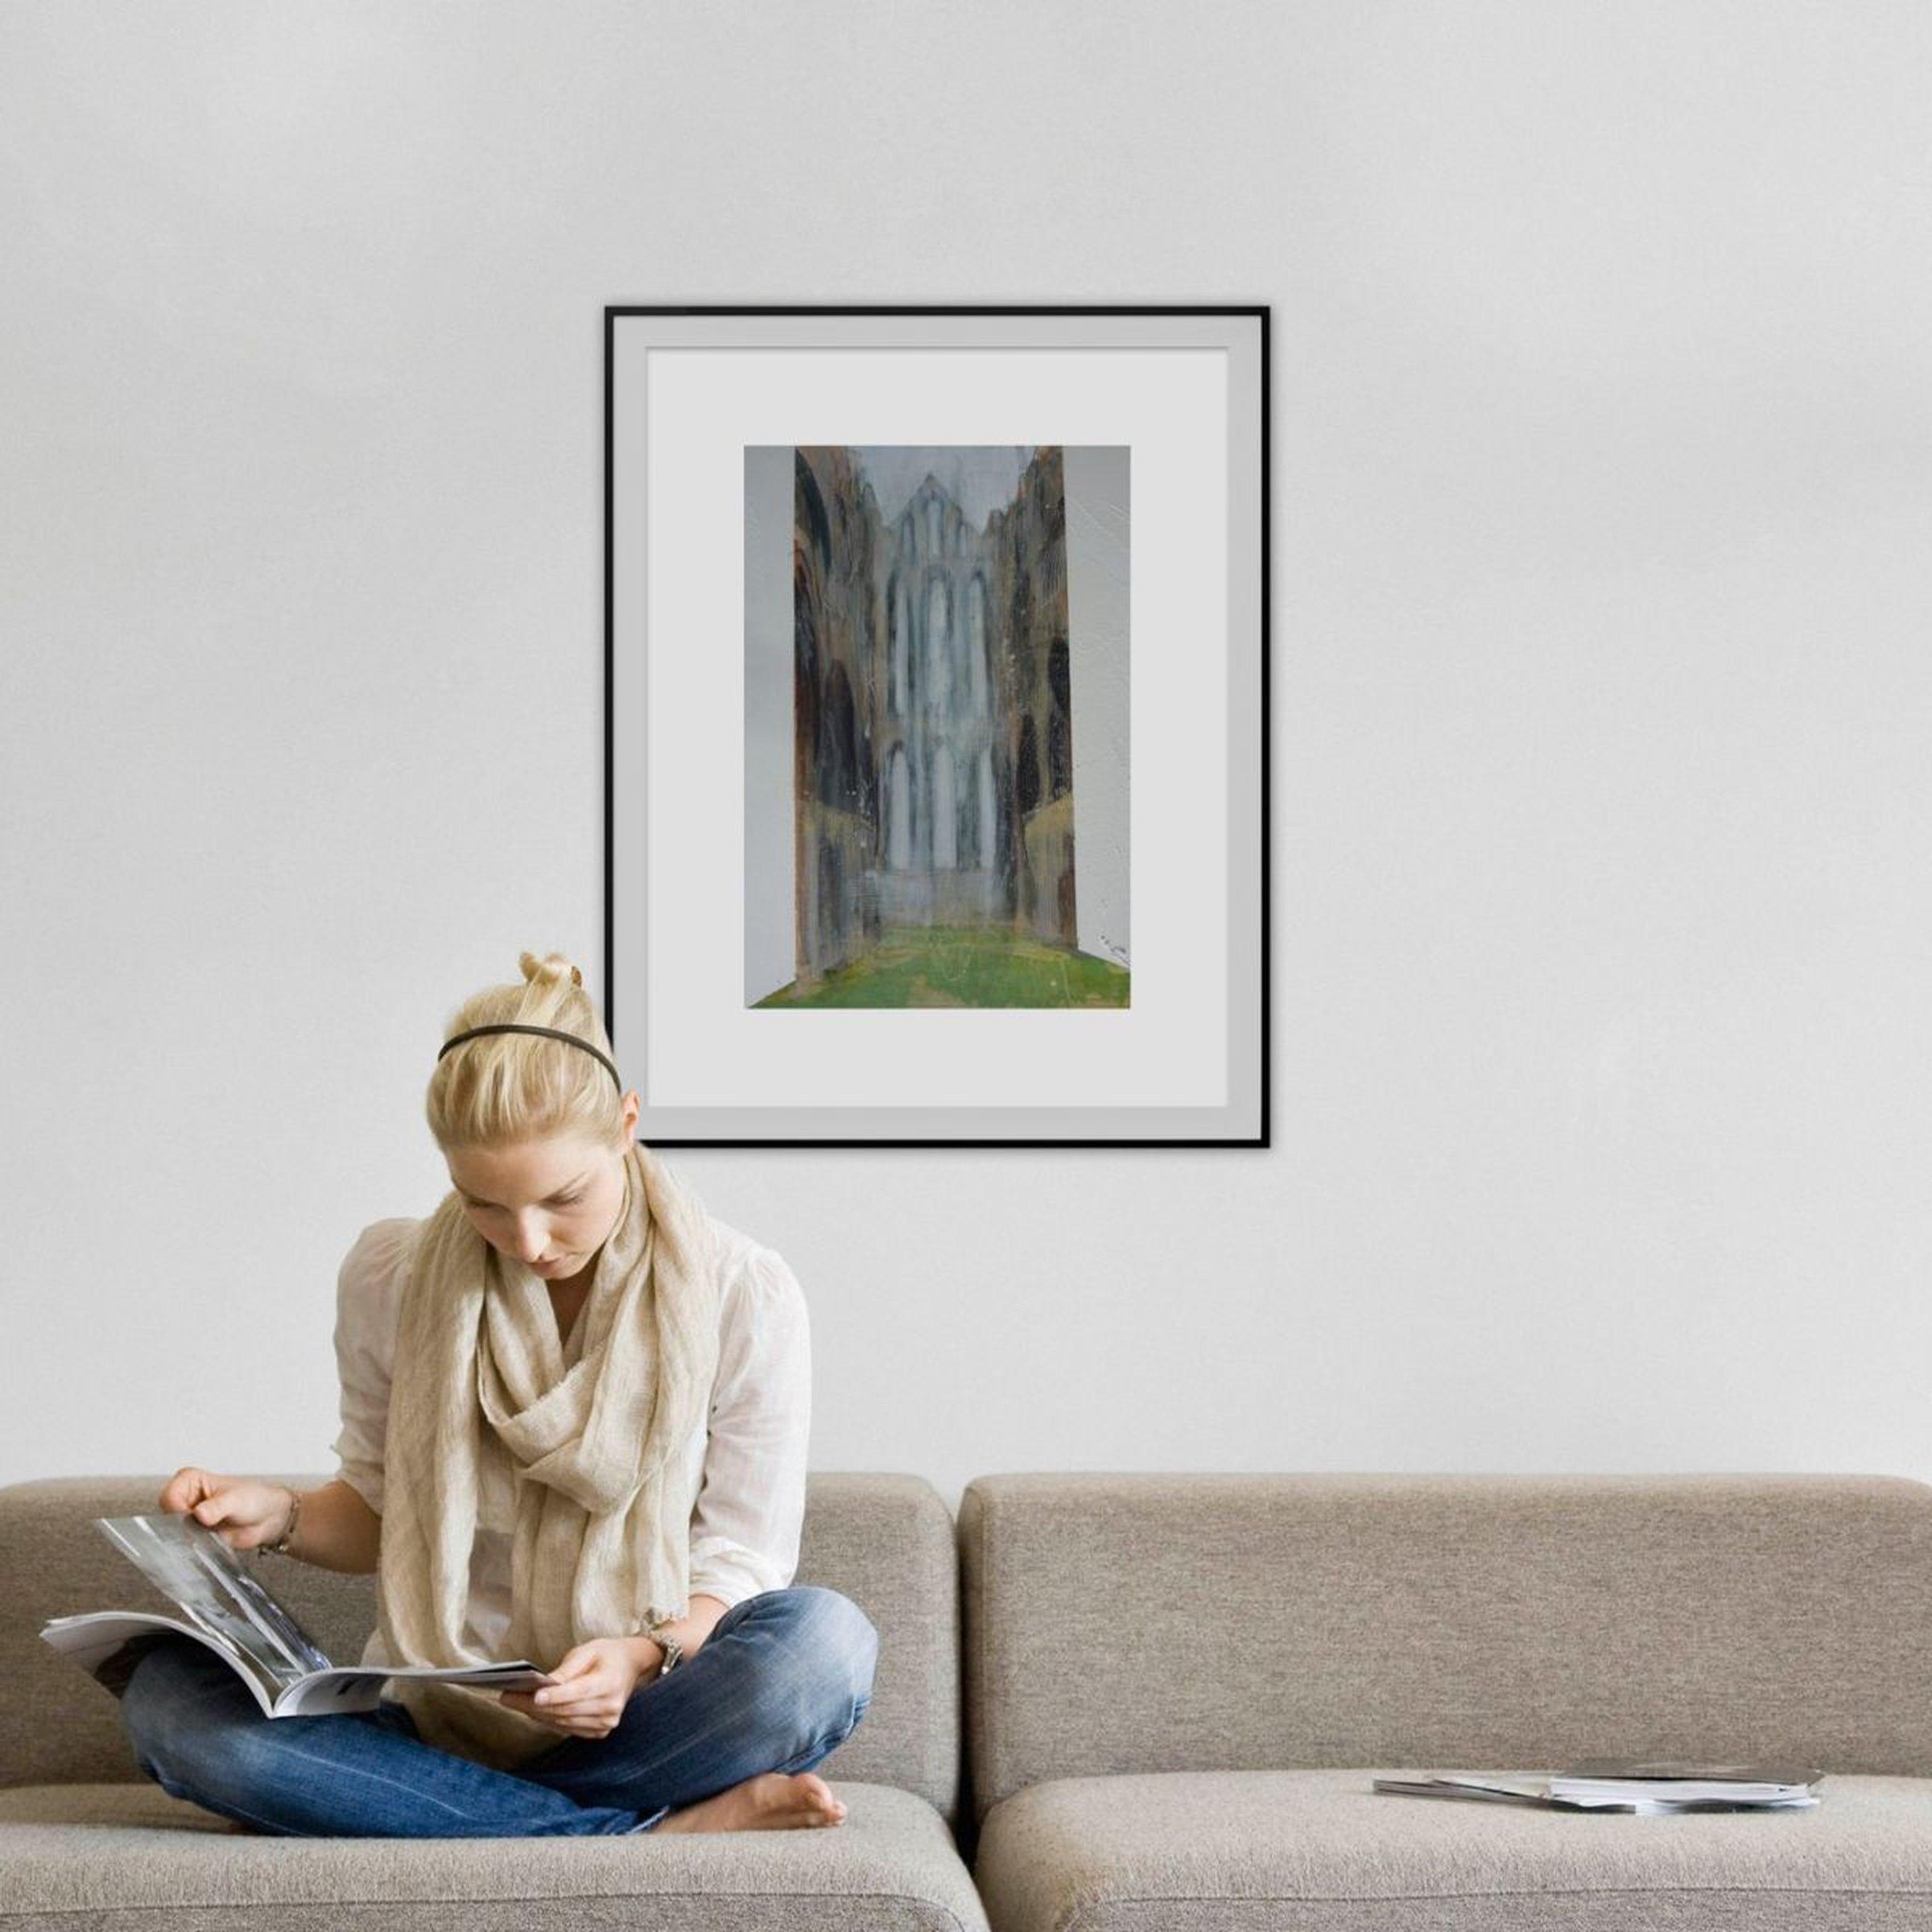 Whitby Abbey Six Acrylic painting by Josh Bowe   Artfinder